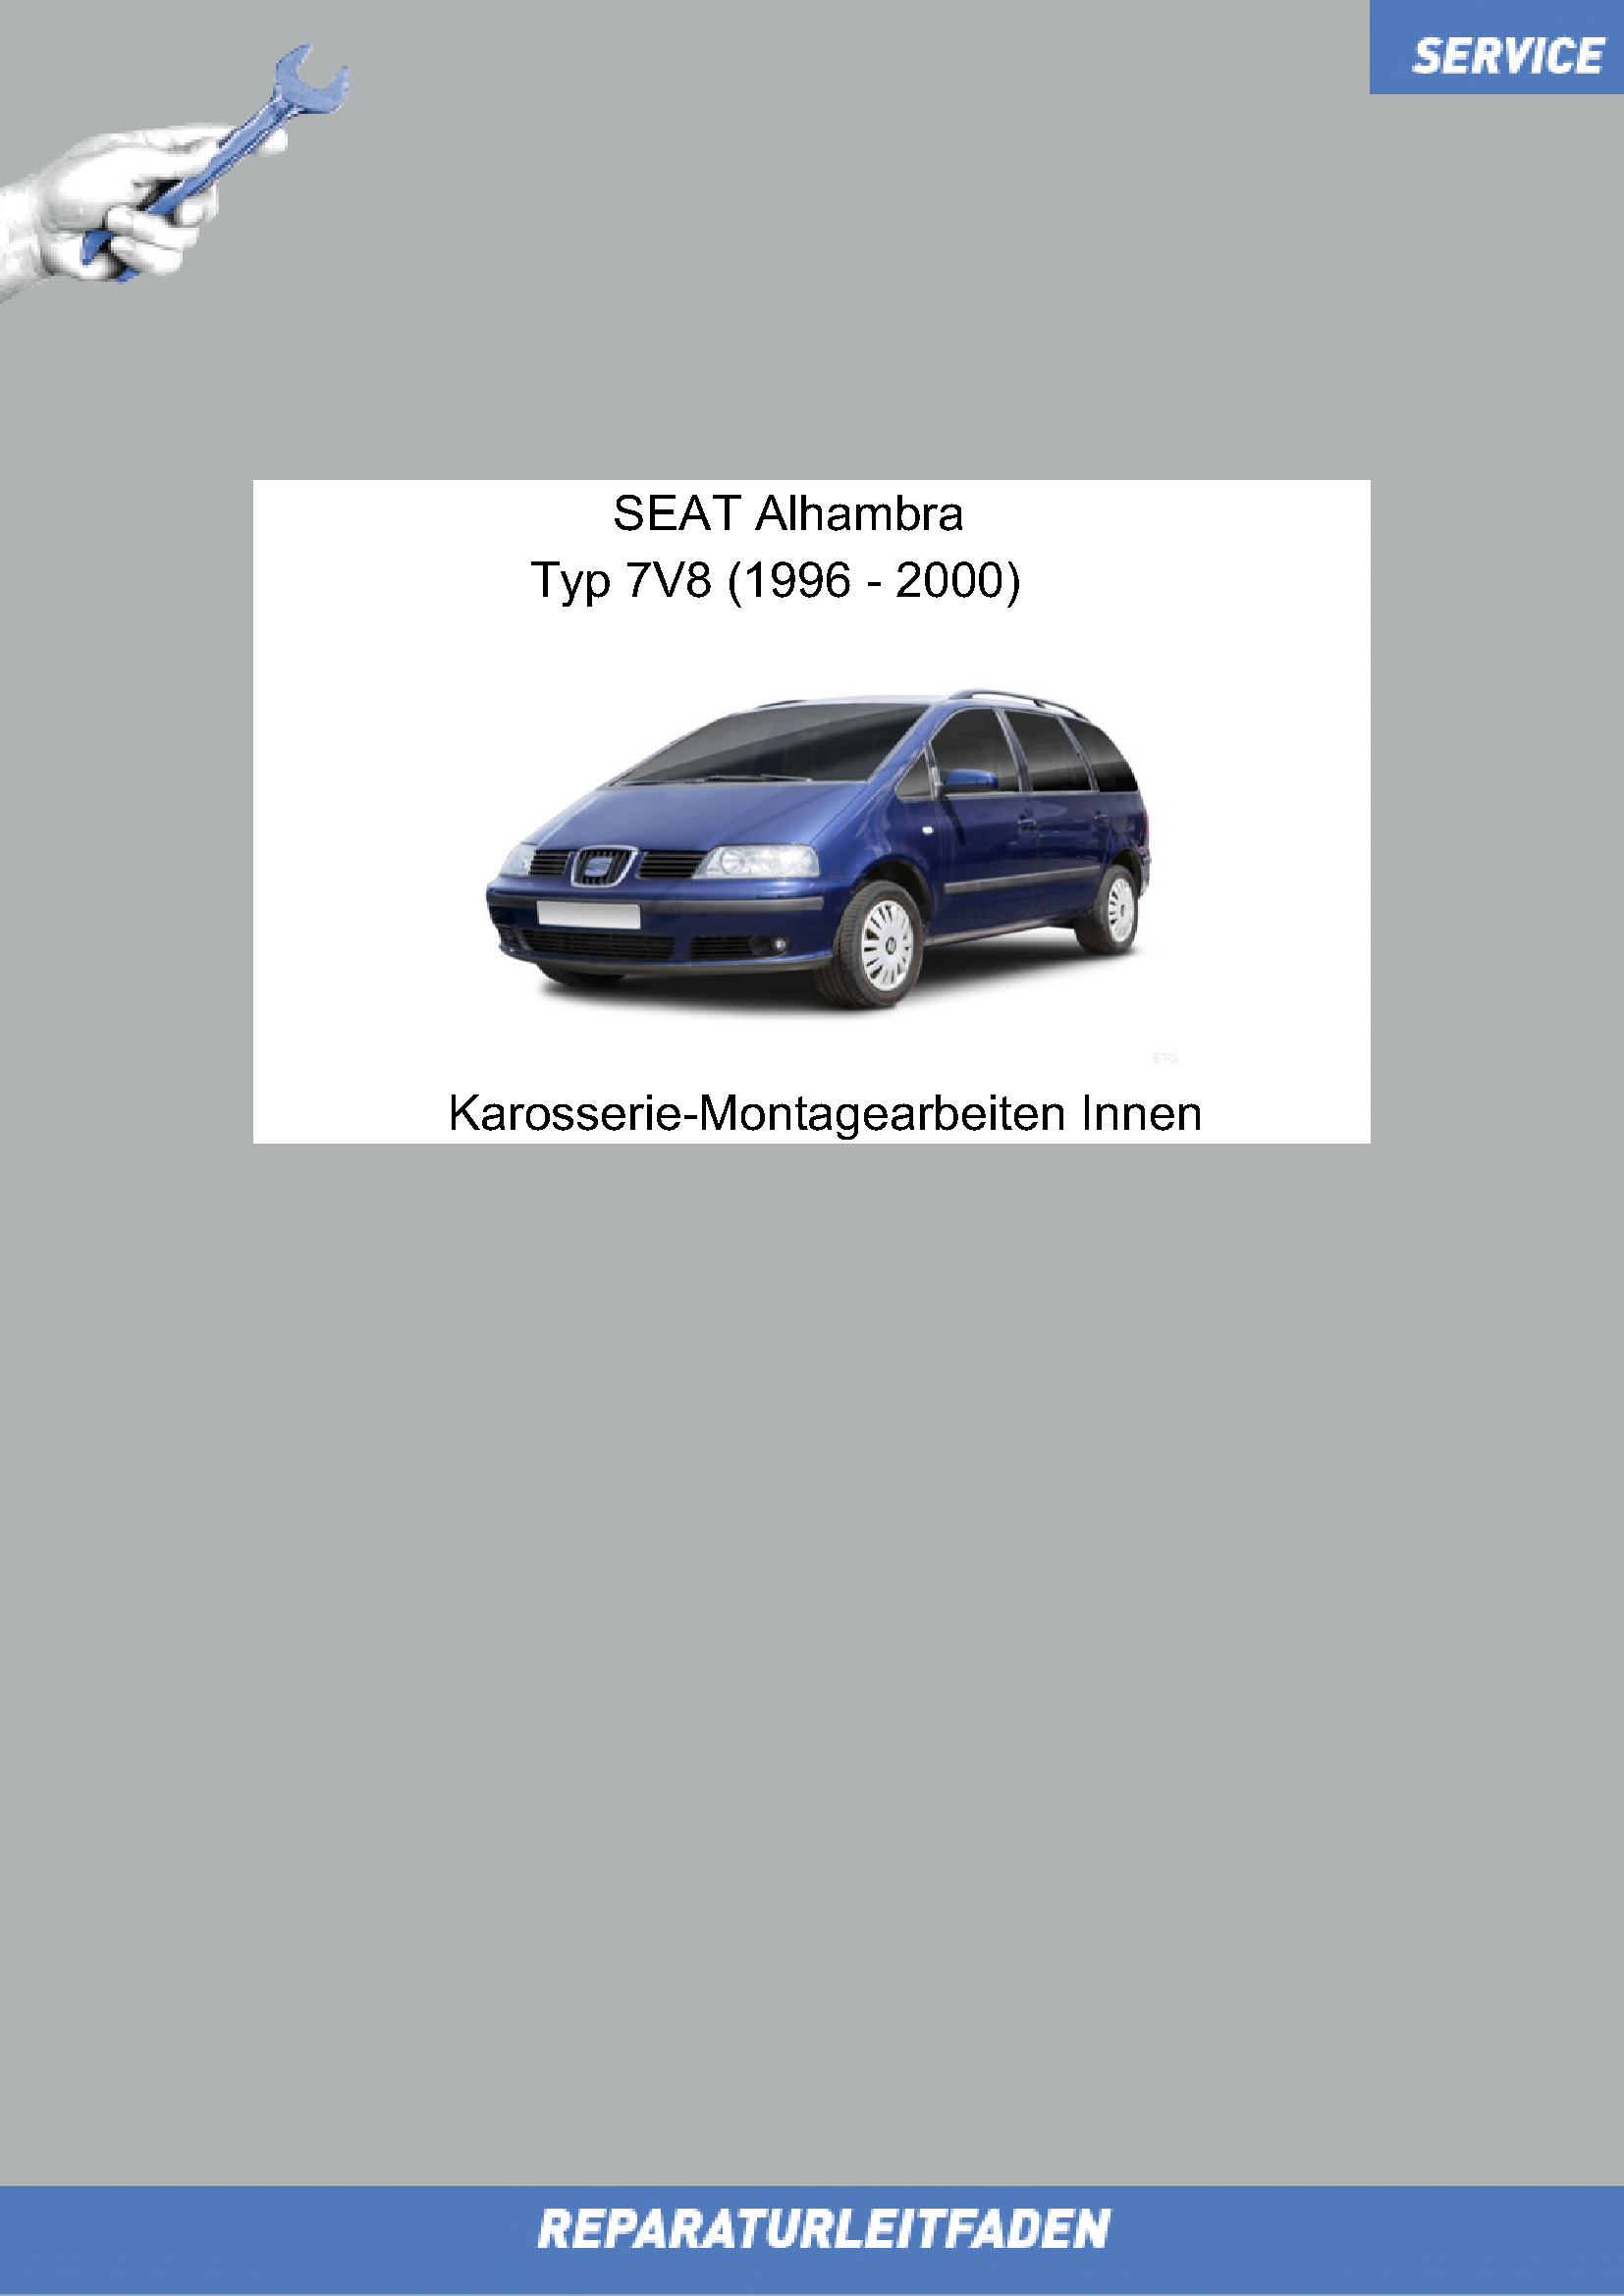 seat-alhambra-7v8-007_zusatzheizung_1.png